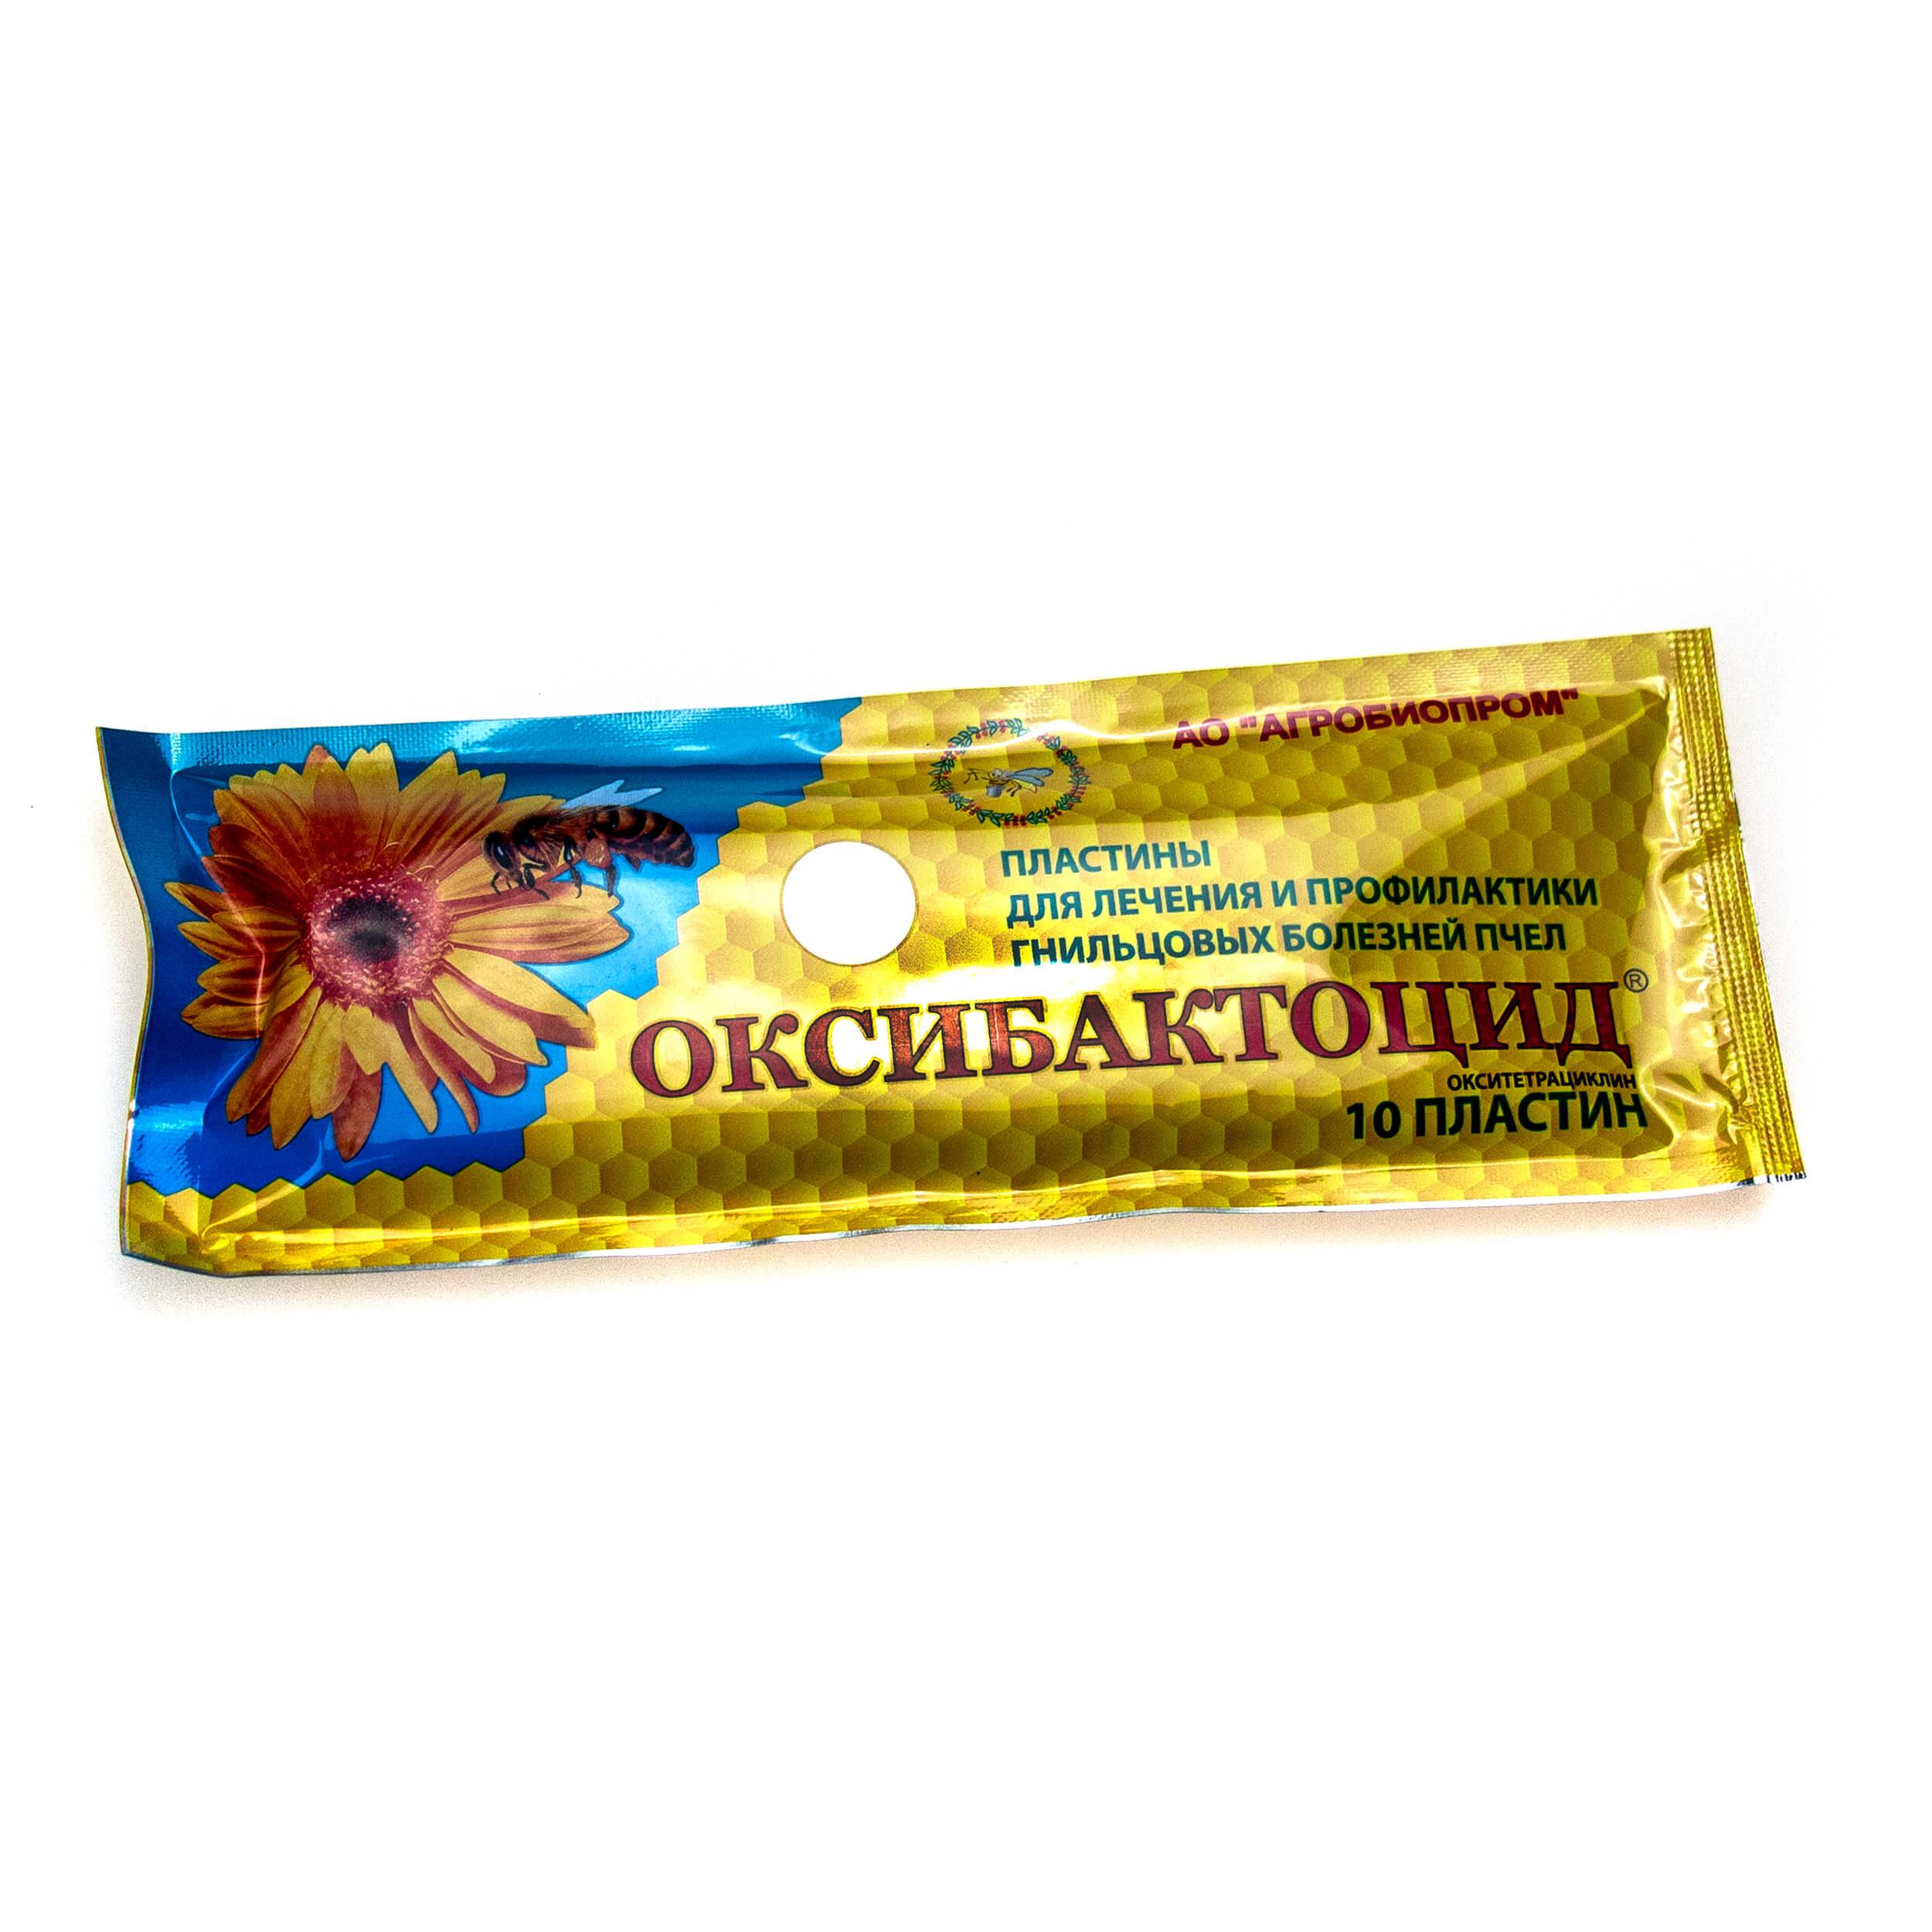 Оксибактоцид (Полоски, 10 шт) фото